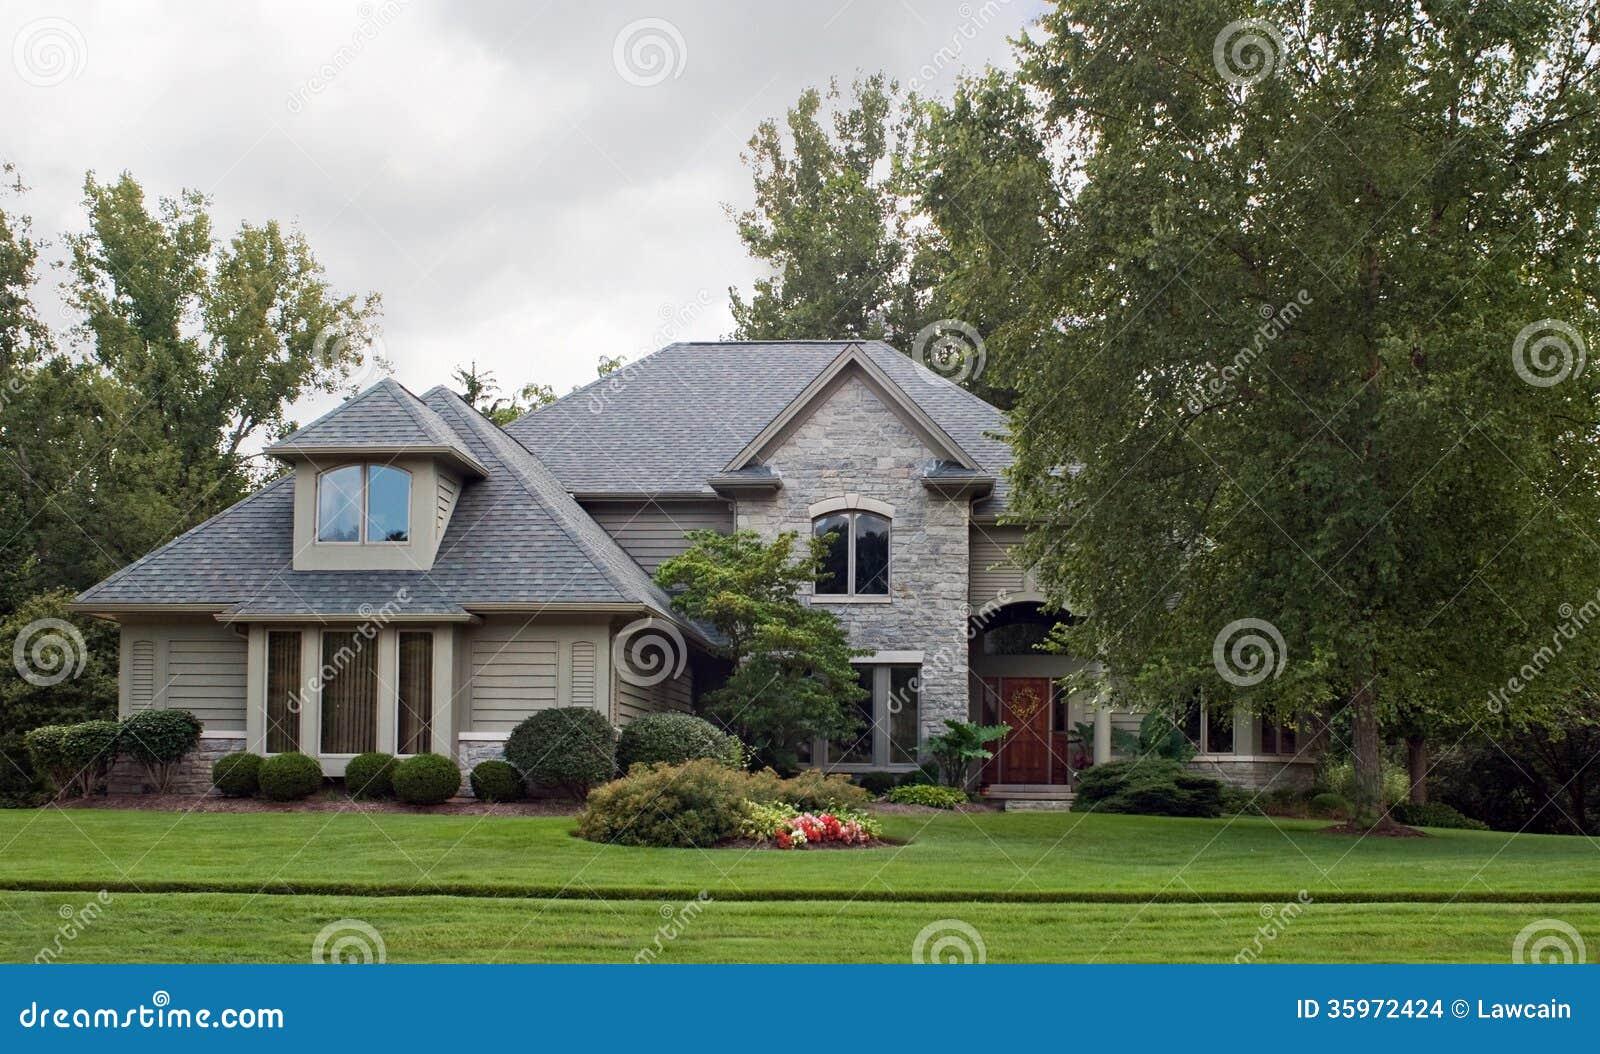 Gray Stone y Tan House